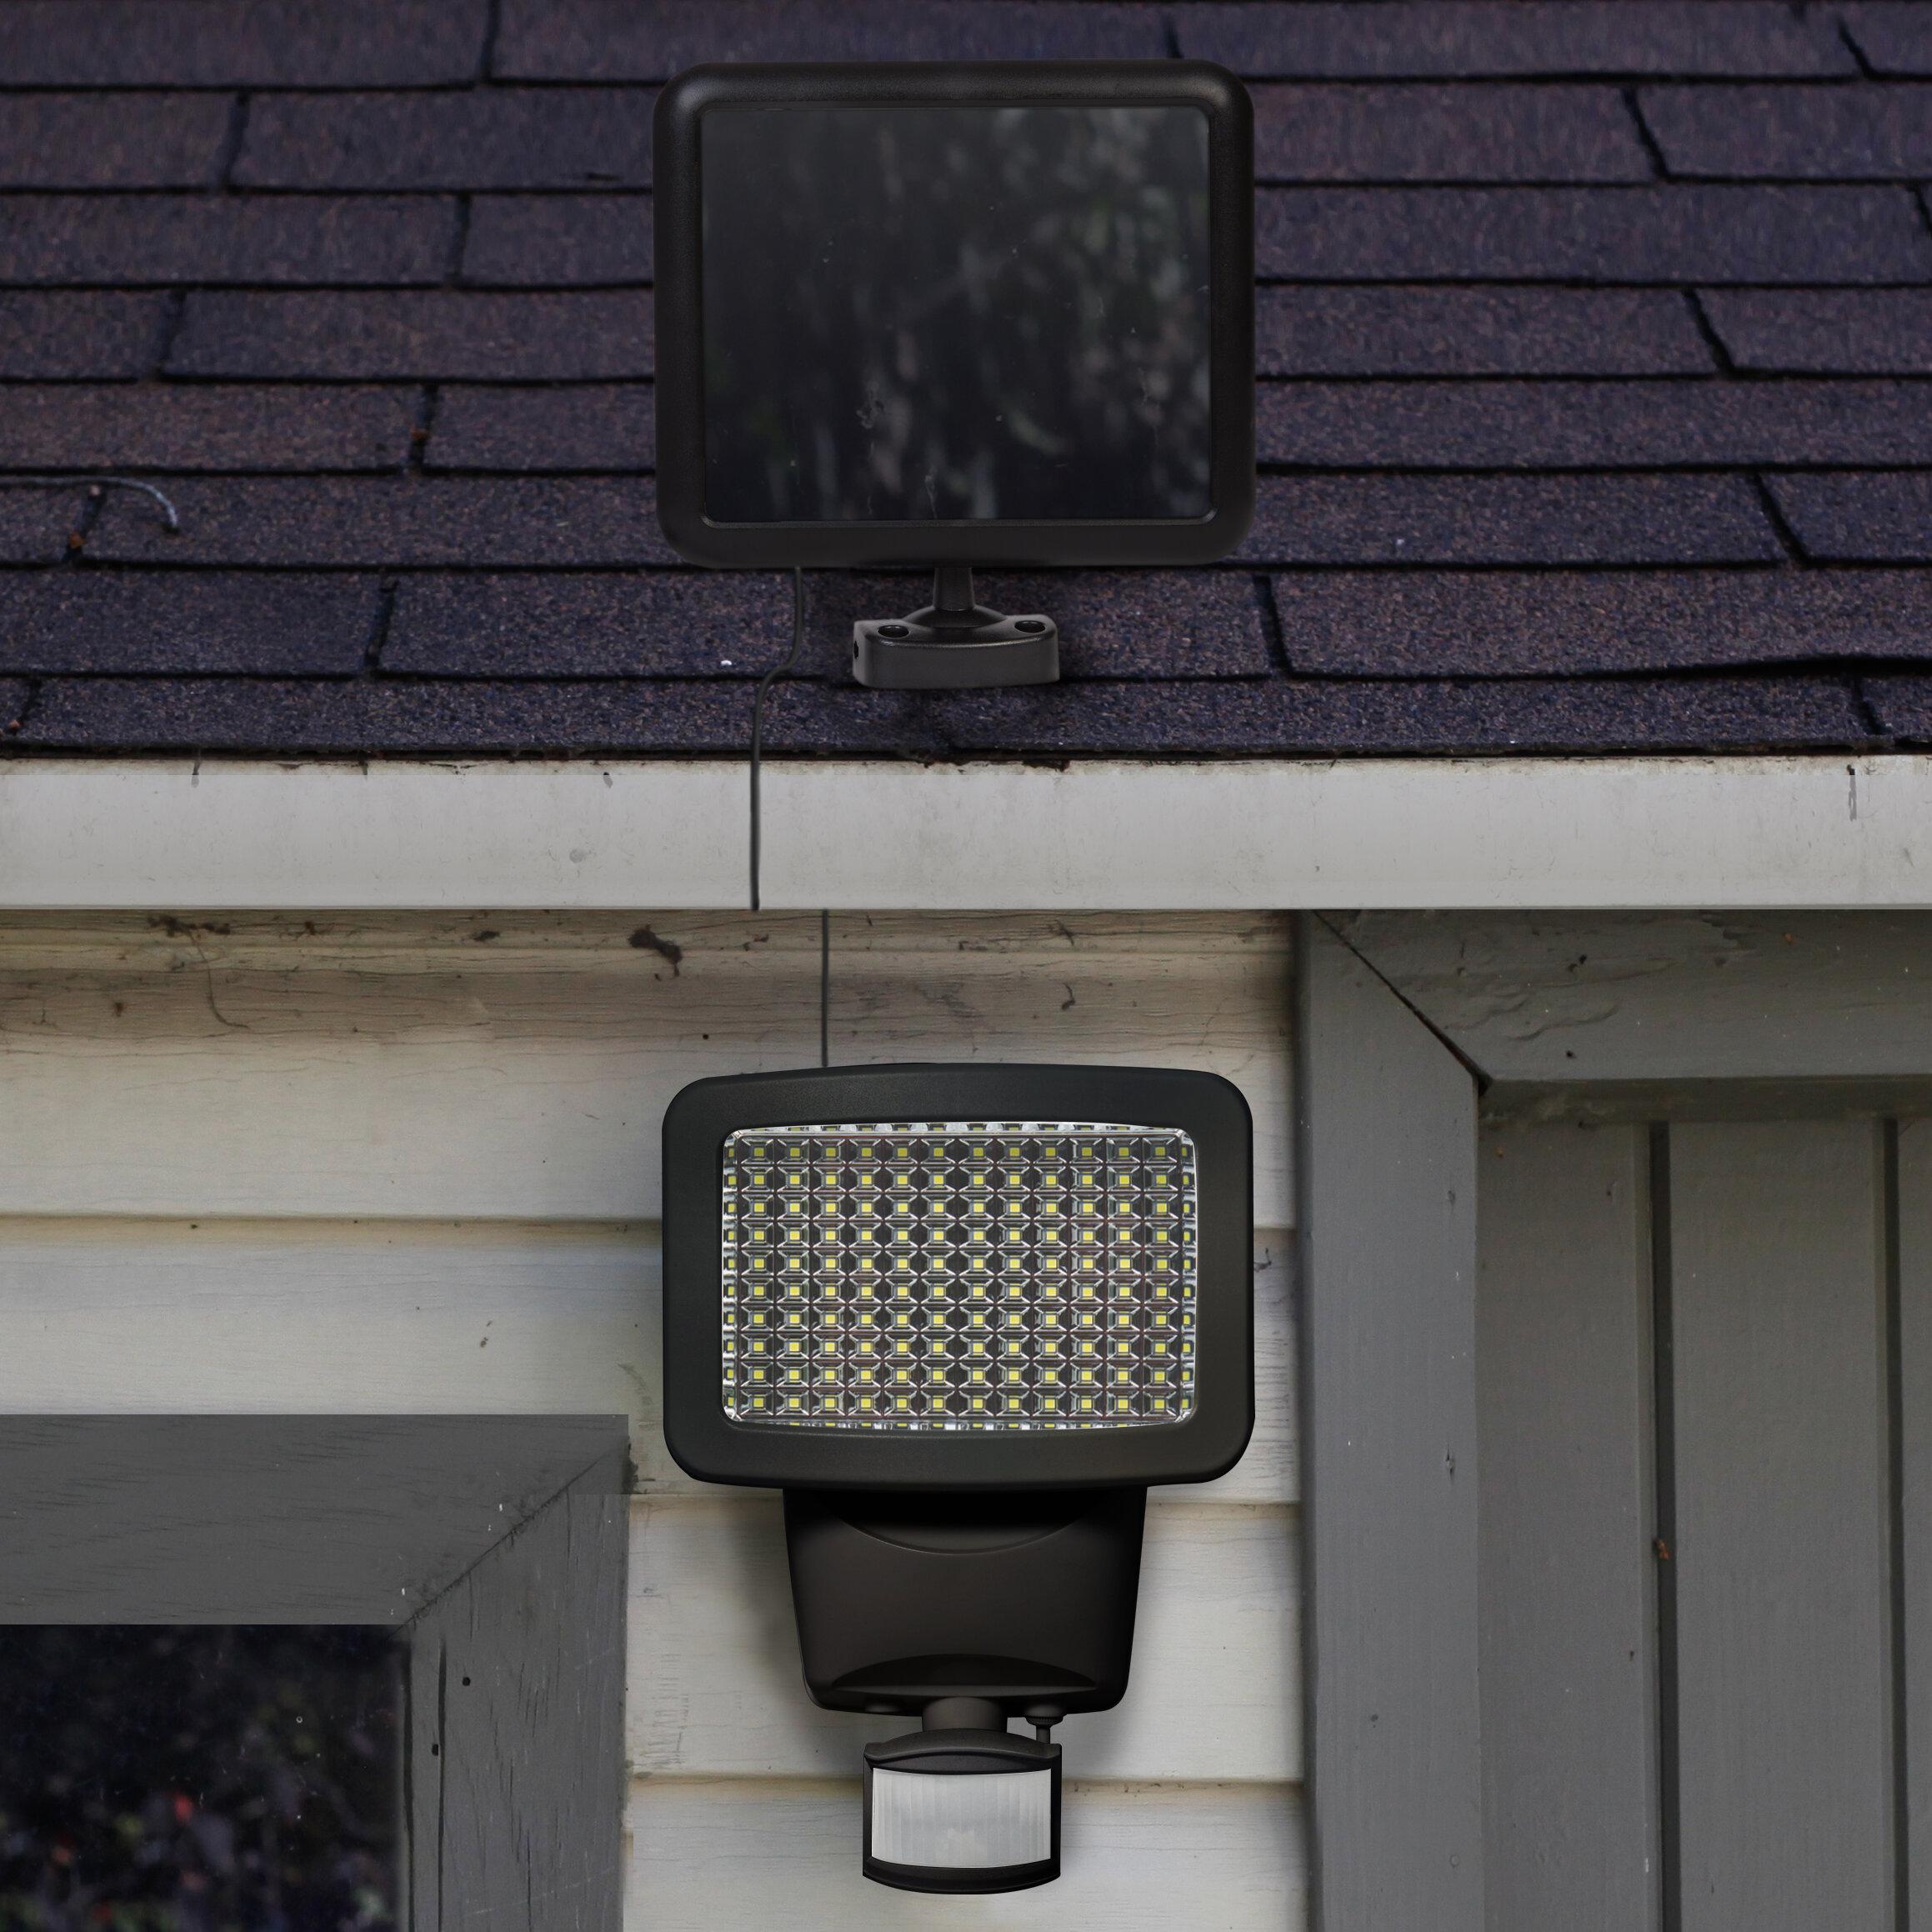 Sunforce Solar Power Outdoor Security Flood Light With Motion Sensor Reviews Wayfair